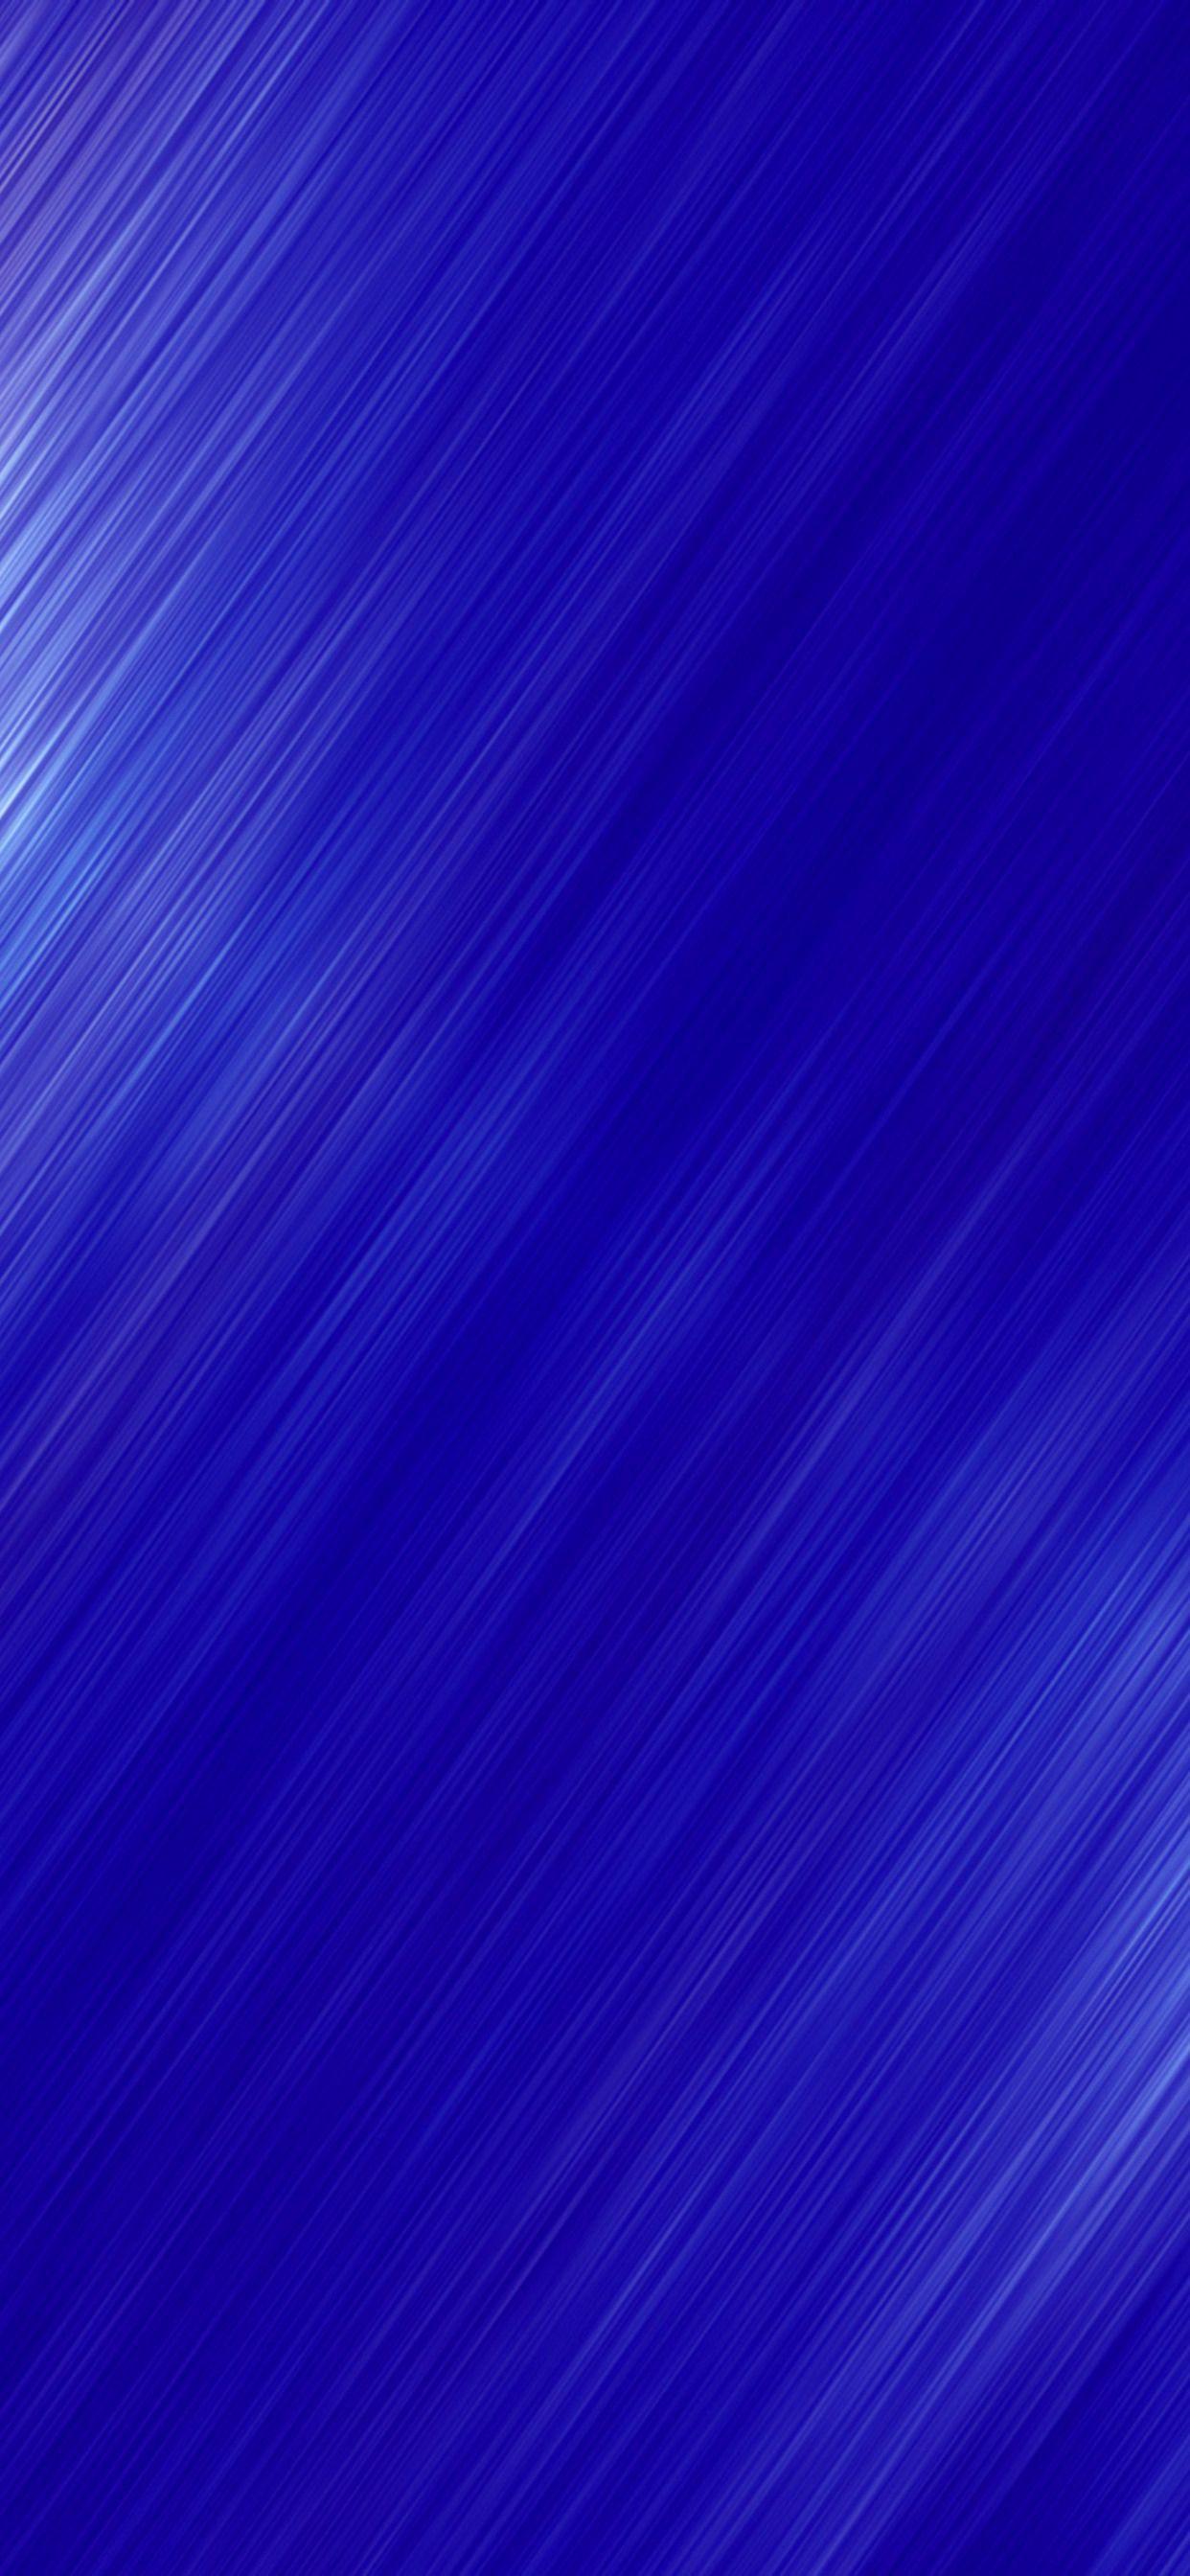 Designed By C Hotspot4u In 2020 Blue Wallpaper Iphone Blue Colour Wallpaper Wallpaper Edge